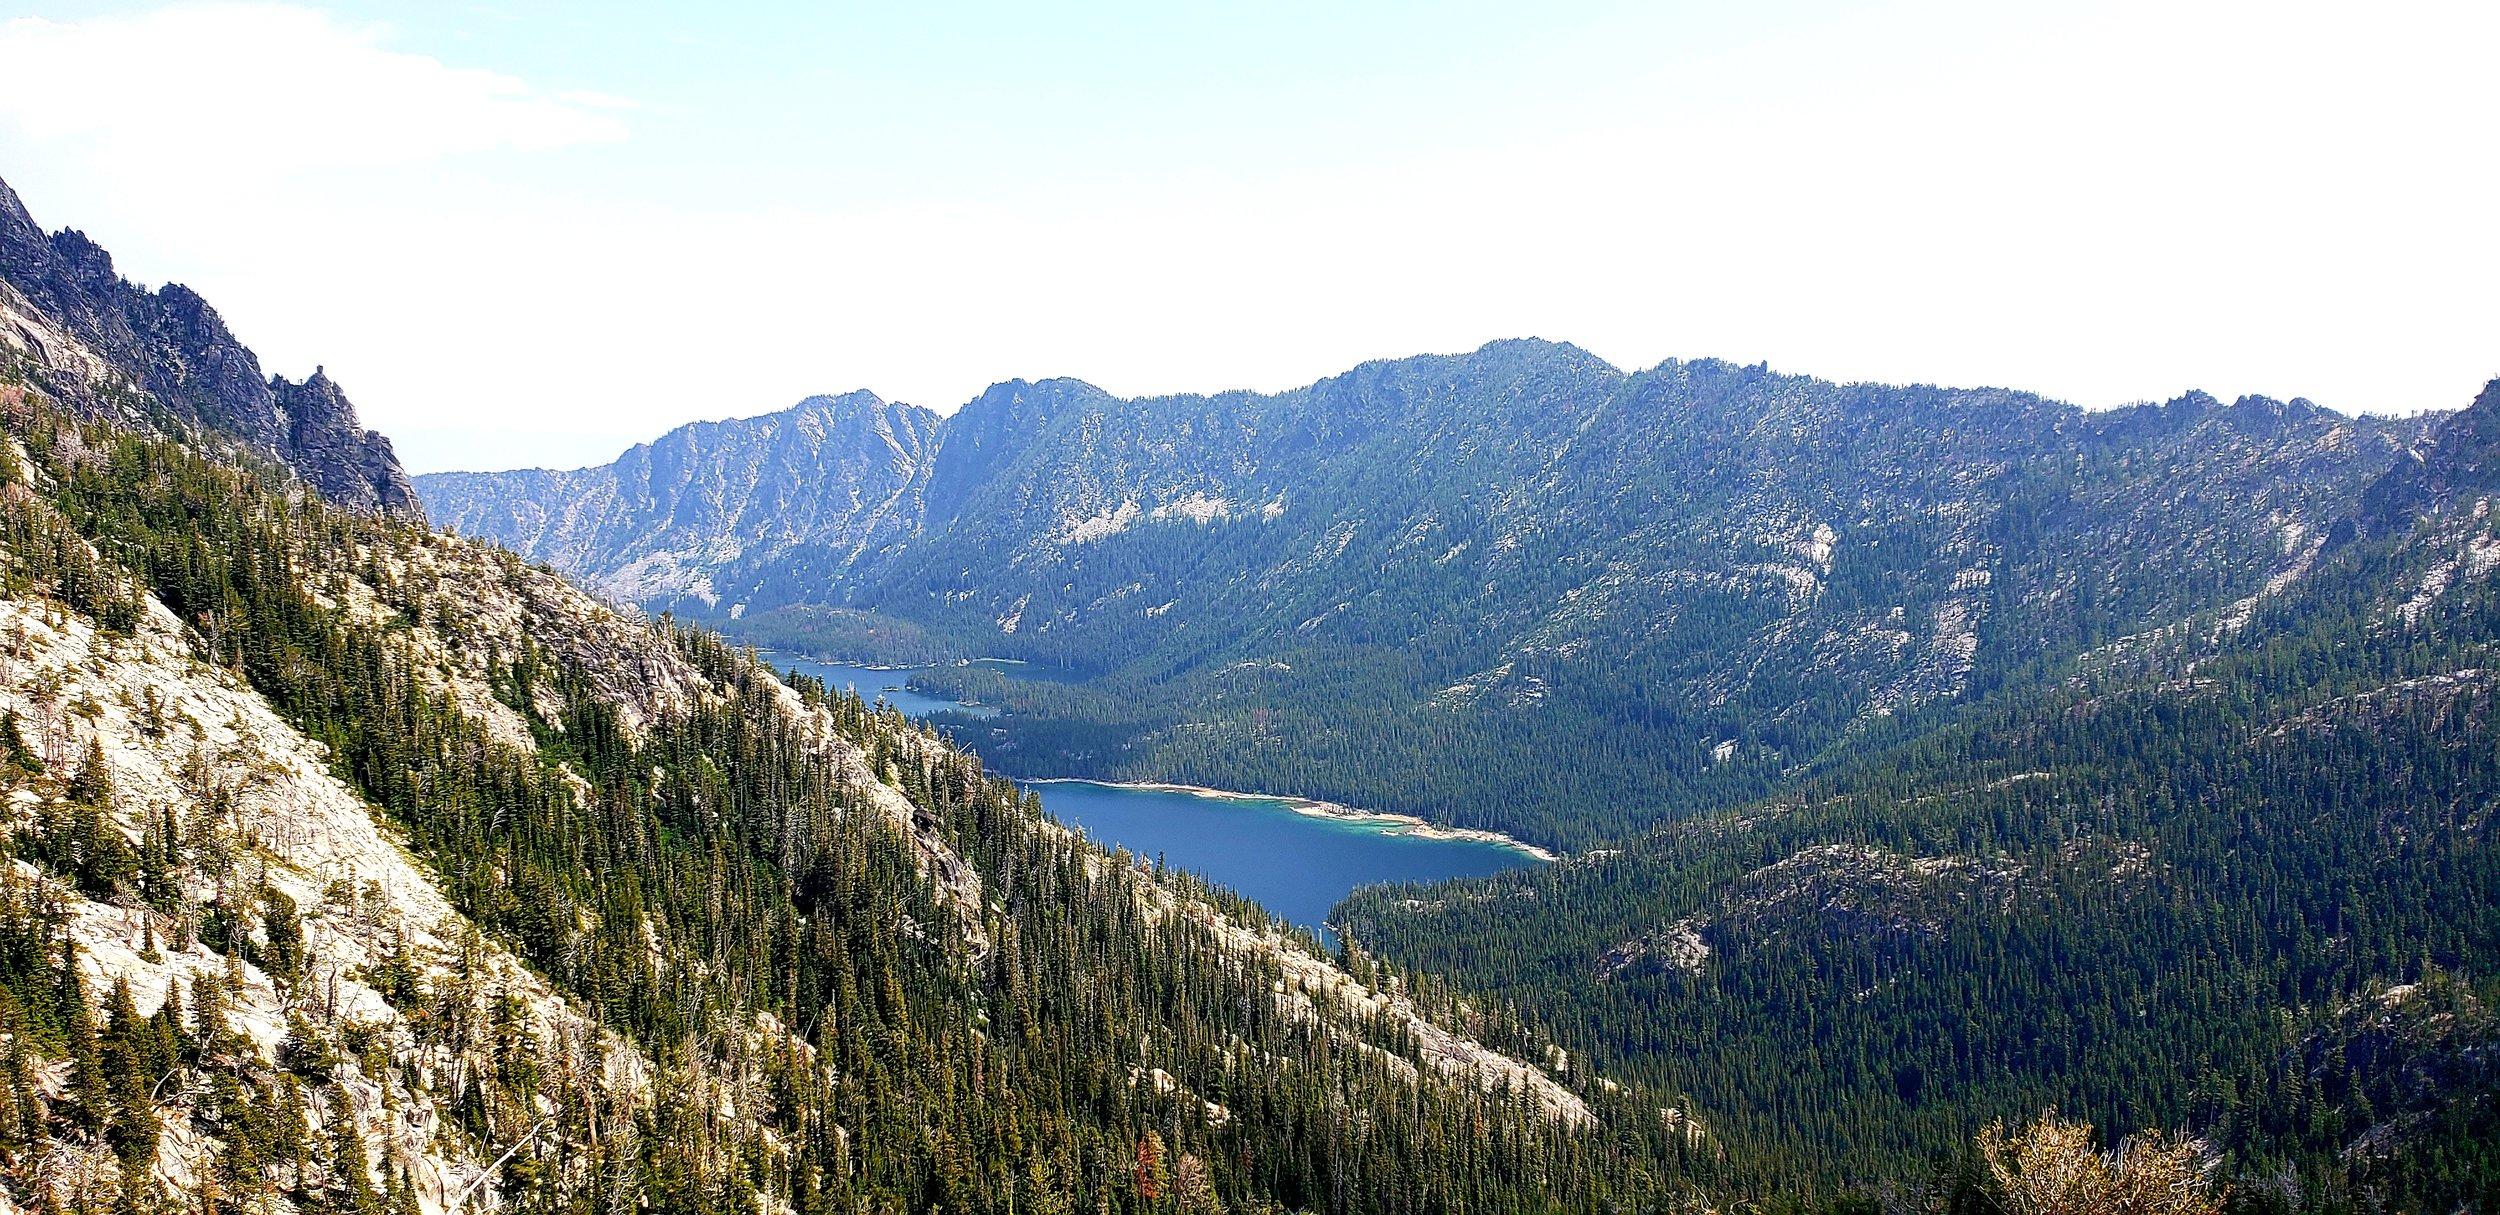 Copy of Snow Lake